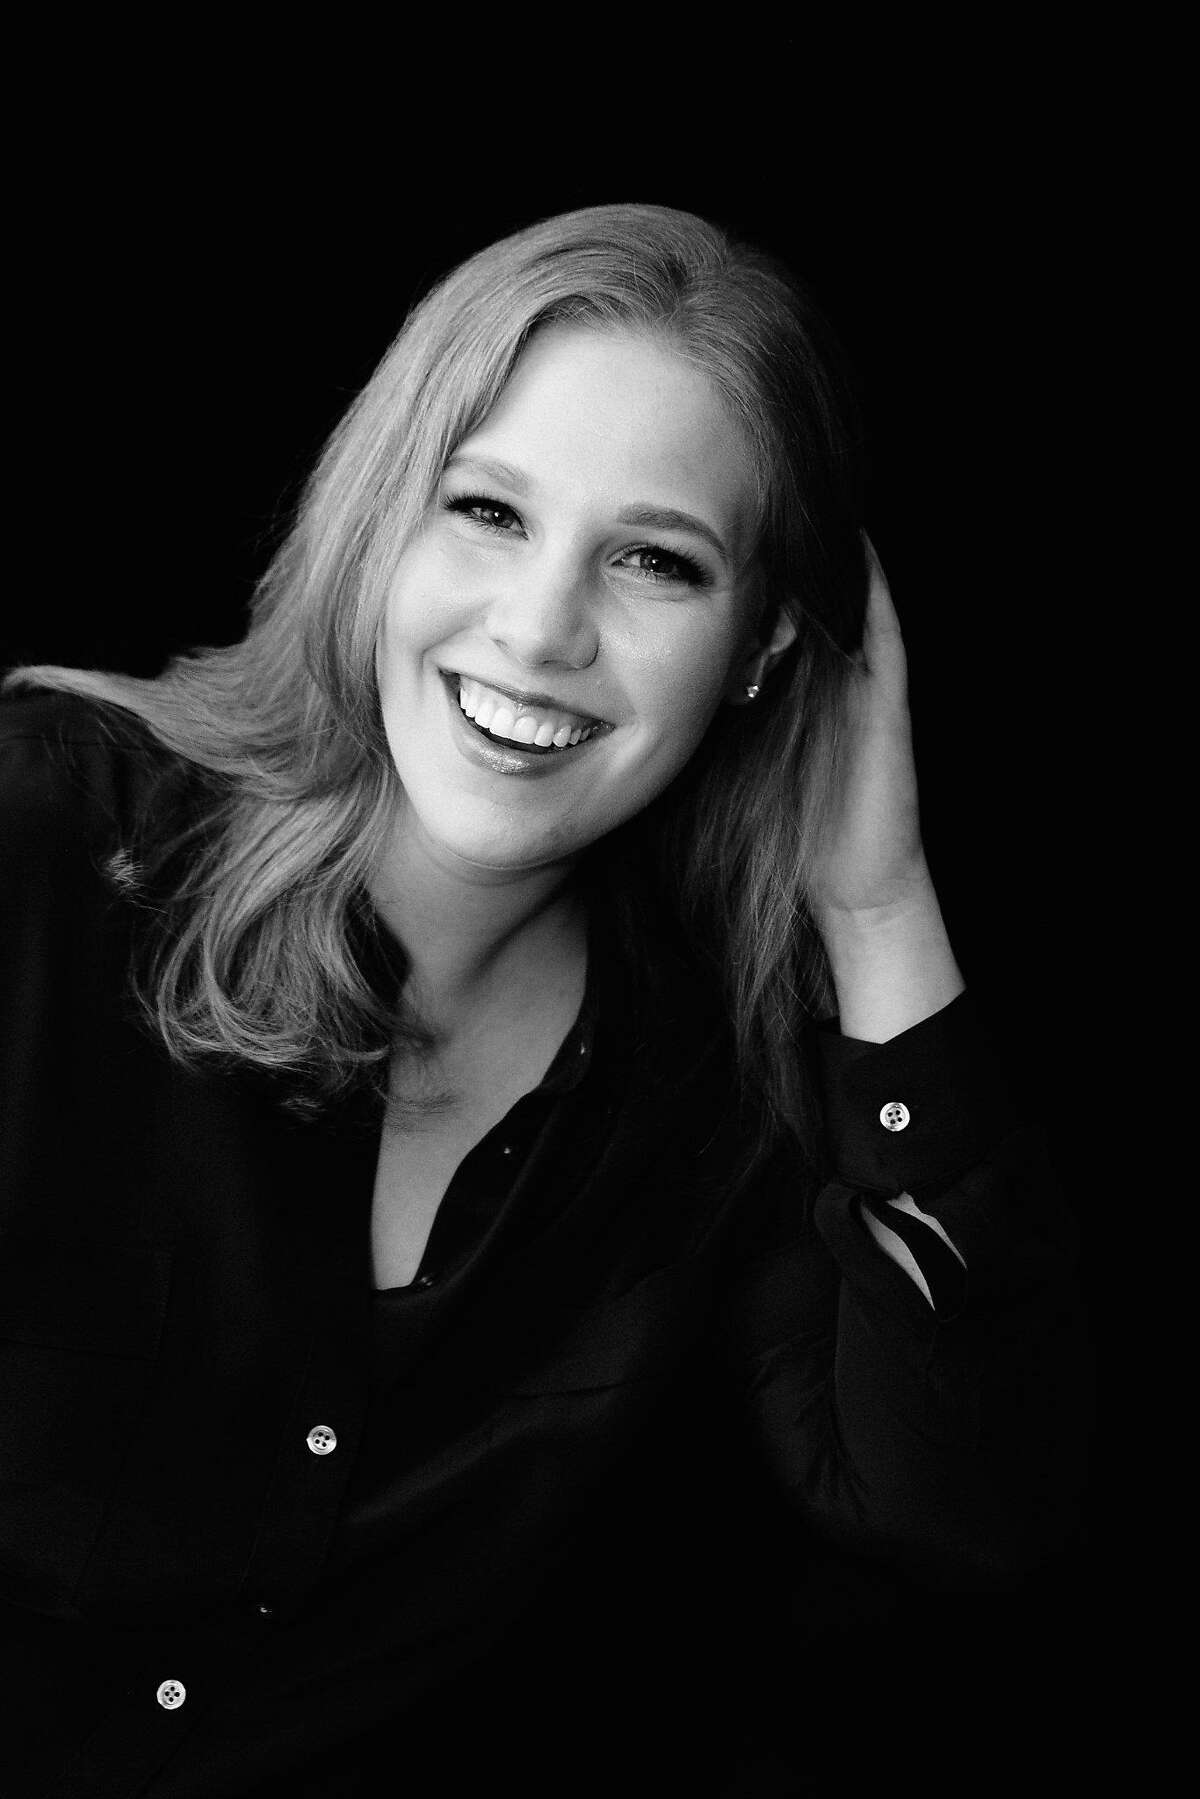 Soprano Sarah Cambidge